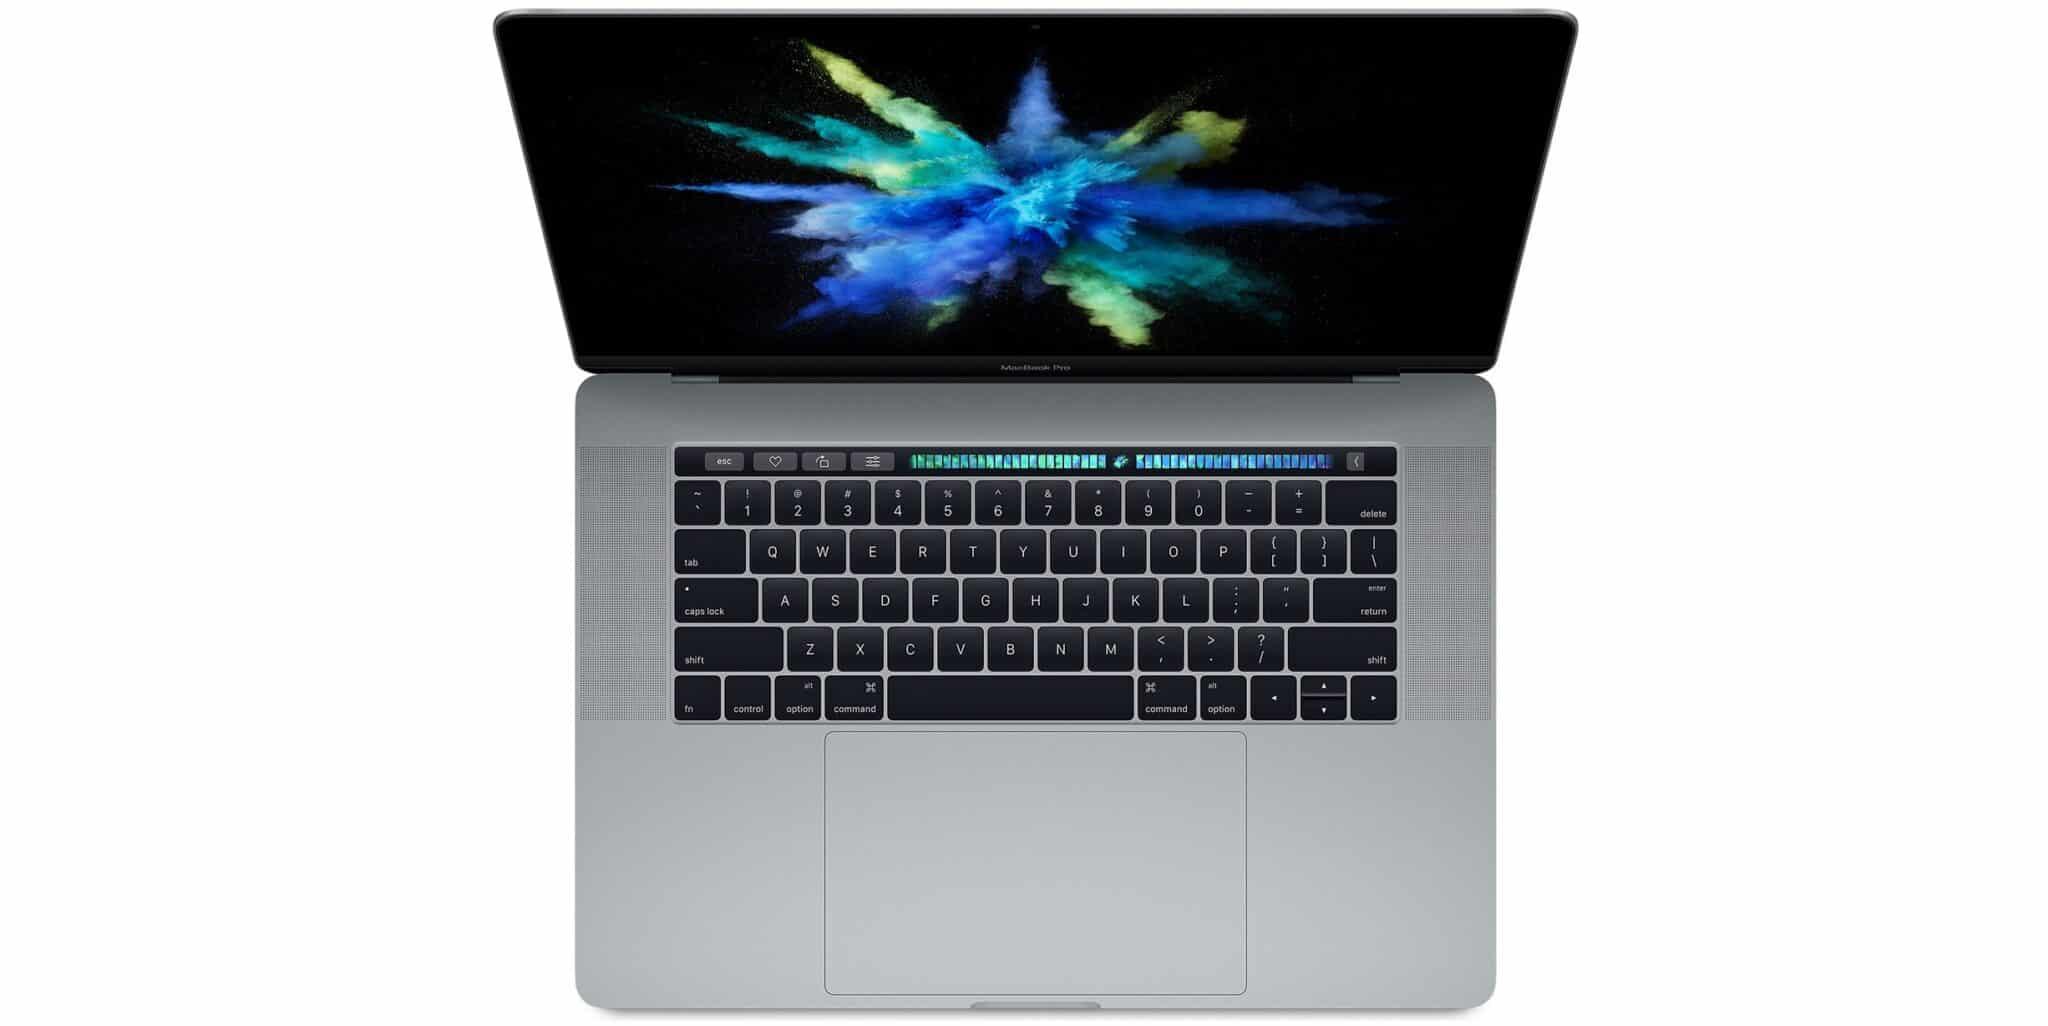 Apple MacBook Pro MlH42LL/A